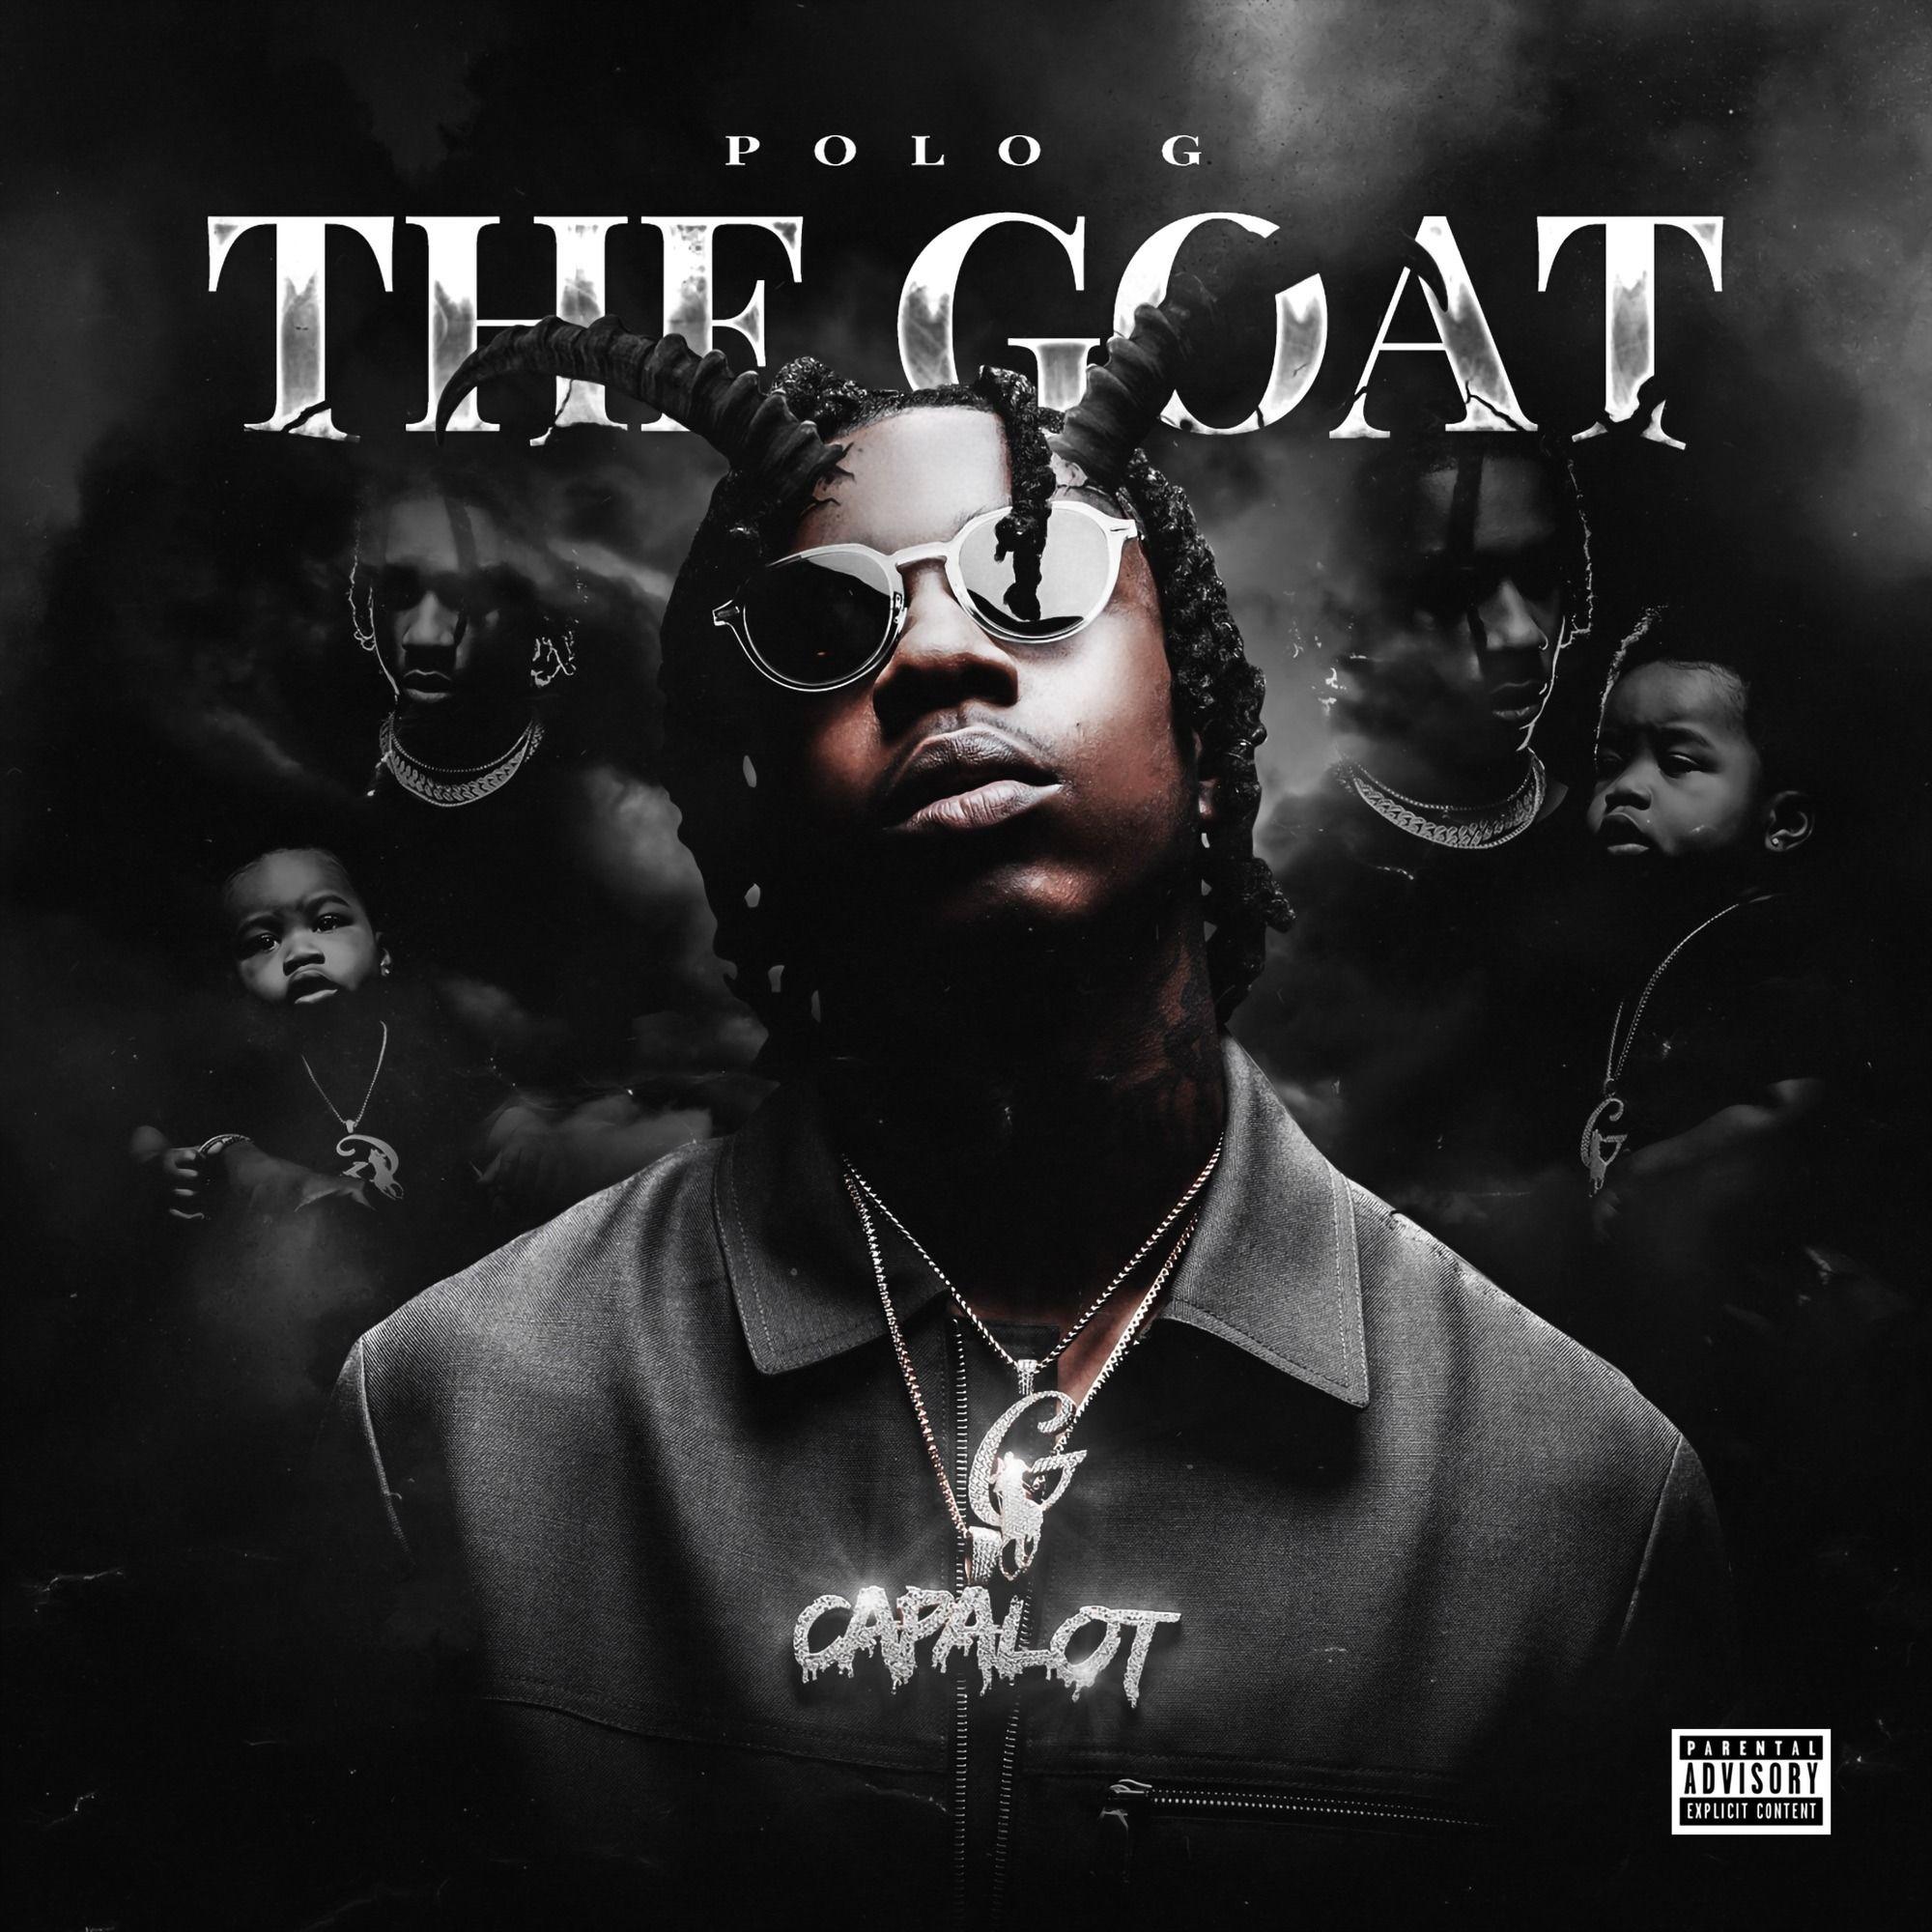 Polo G The Goat Iconic Album Covers Music Album Cover Rap Album Covers